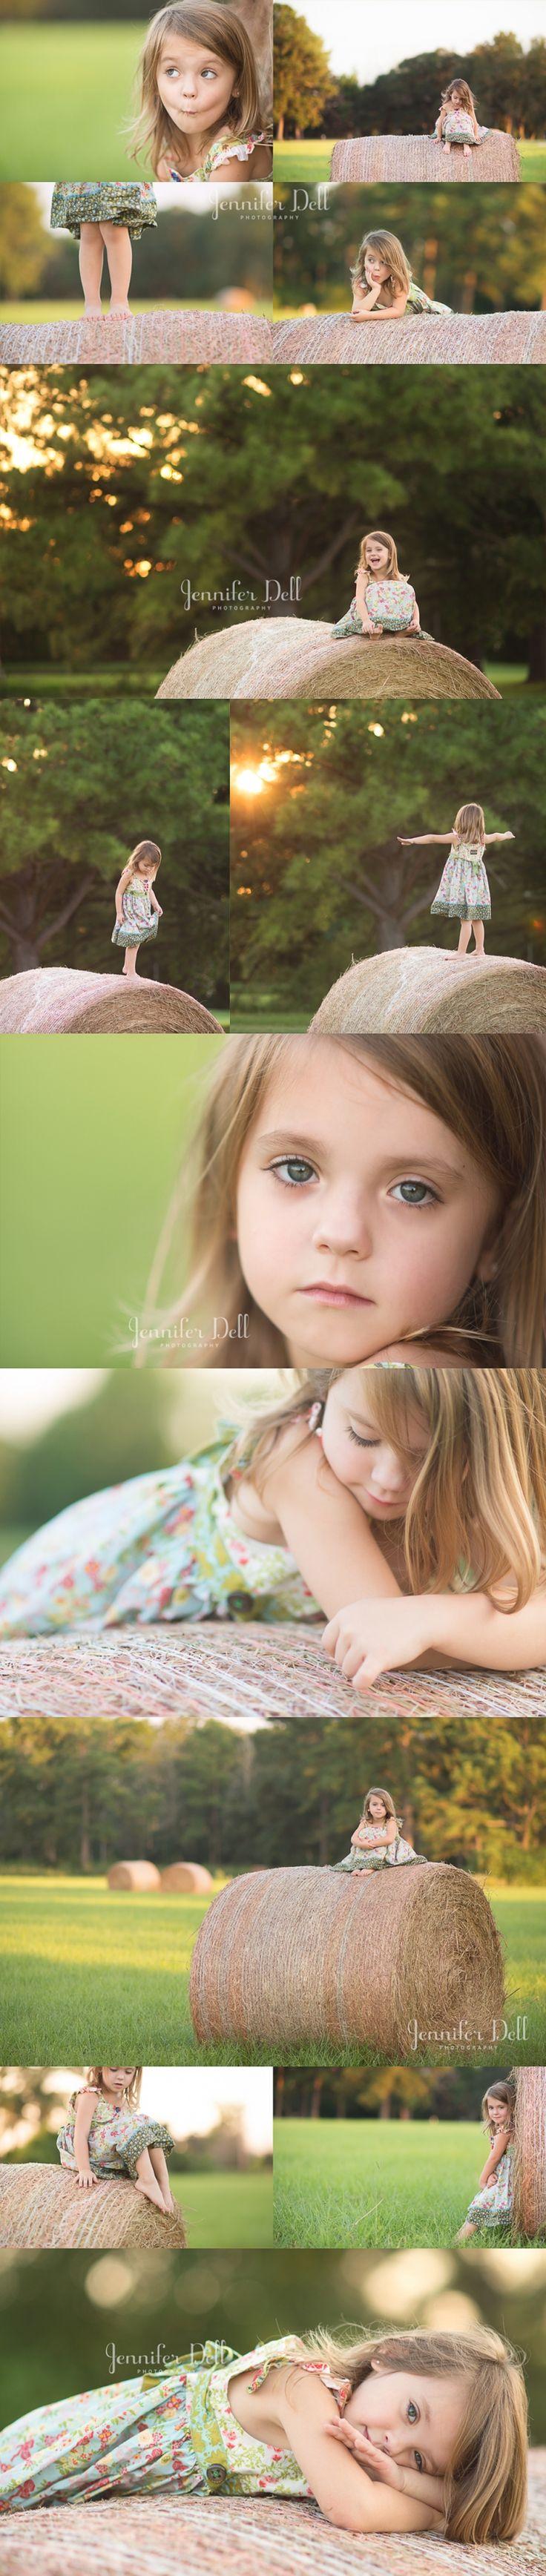 houston-child-photographer  © Jennifer Dell Photography | 2012